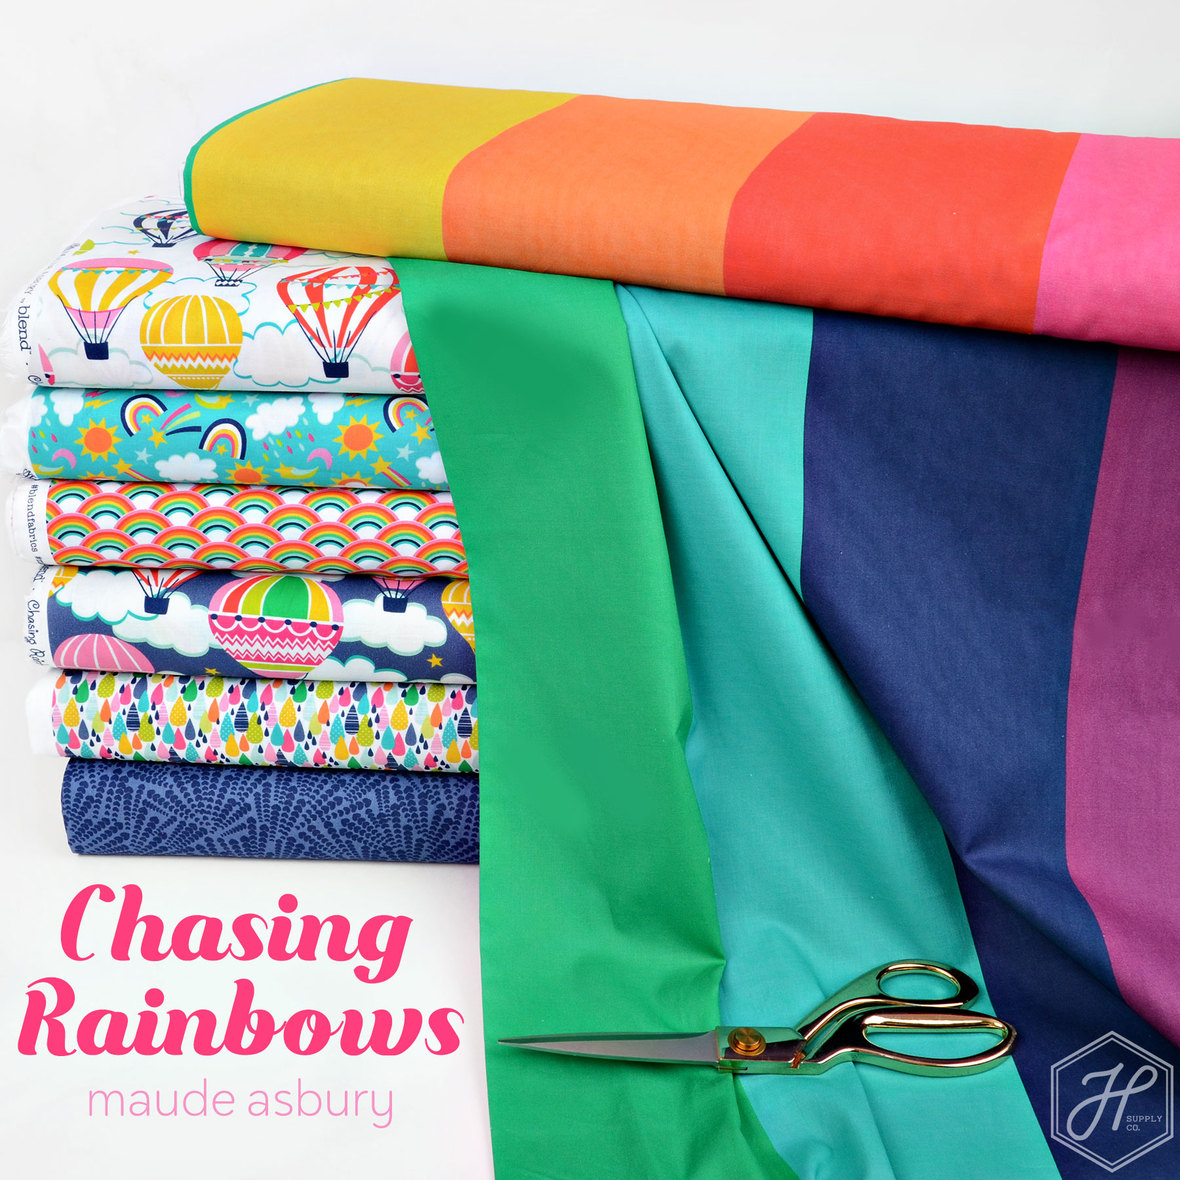 Chasing-Rainbows-Fabric-Maude-Asbury-for-Blend